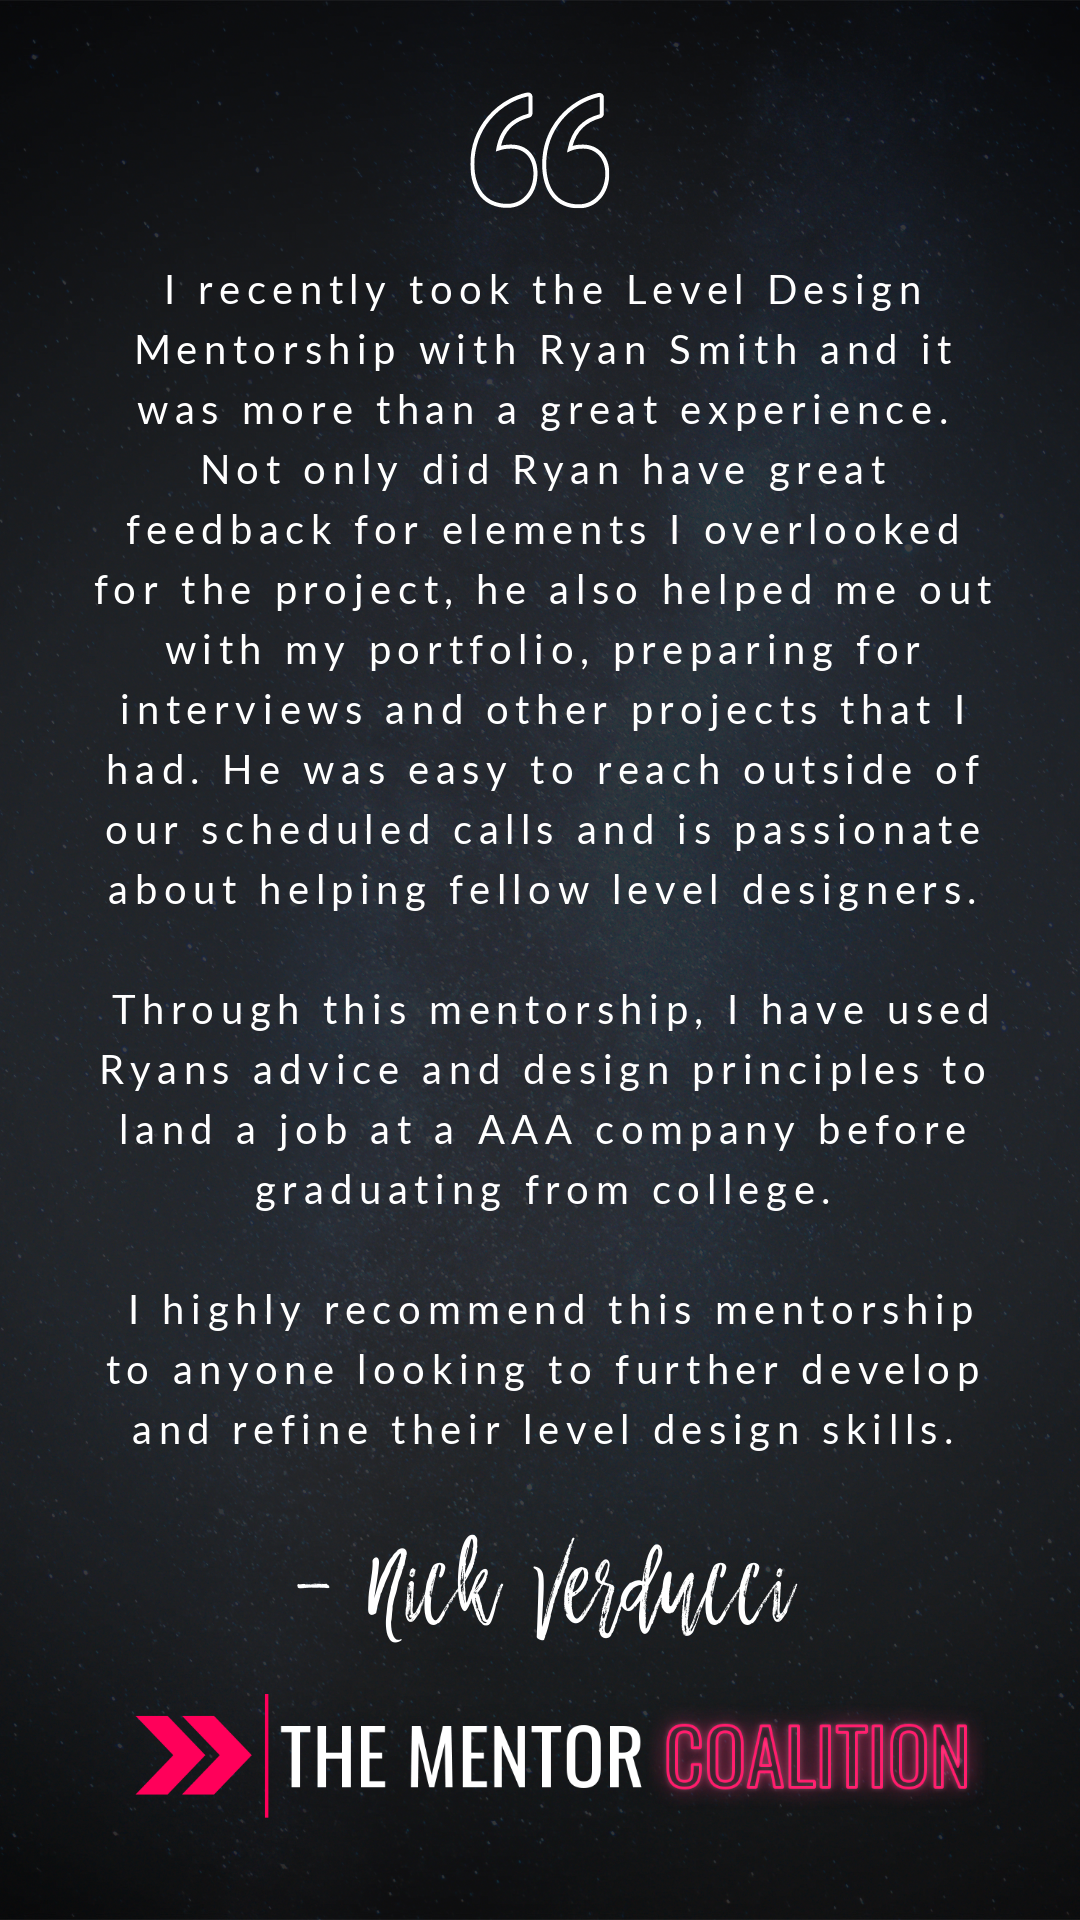 Ryan_Smith - Nick Verducci.png